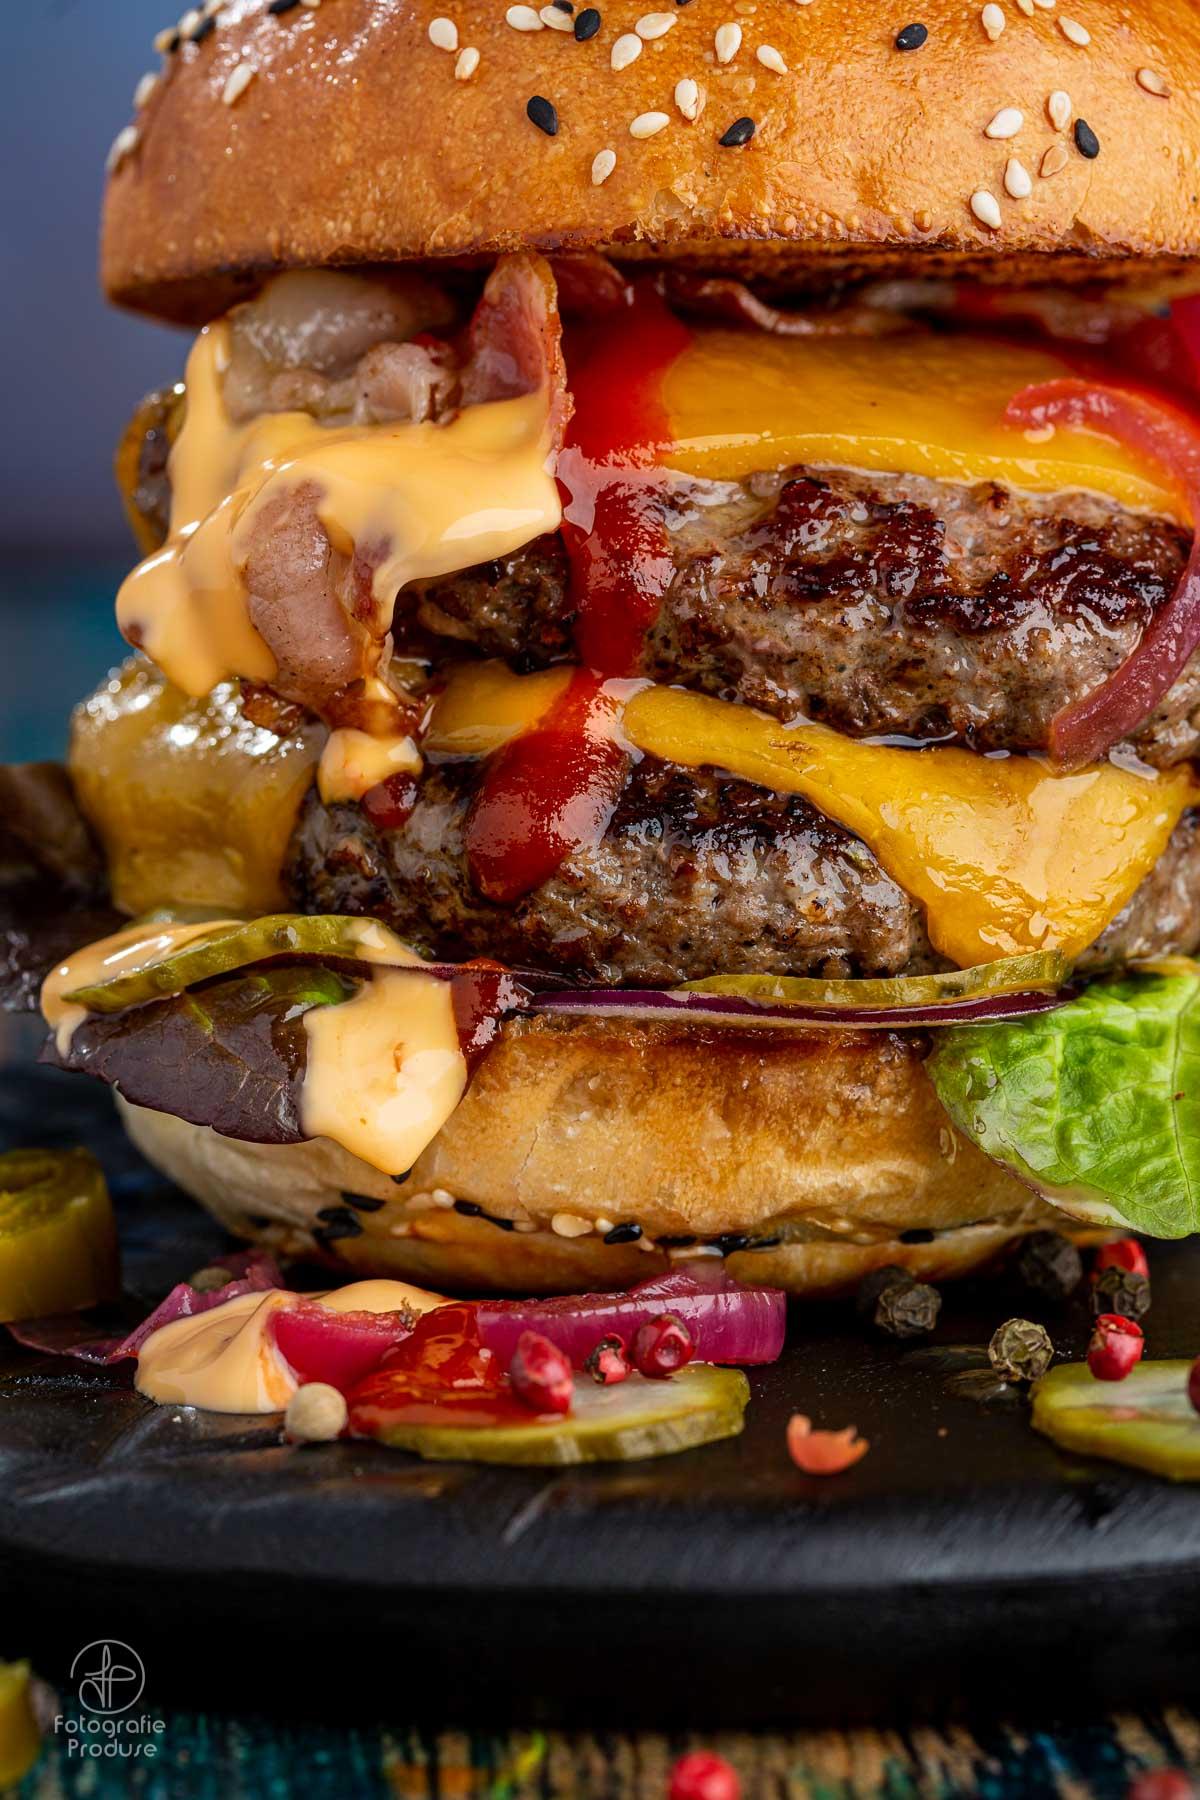 Fotografie de detaliu a unui burger